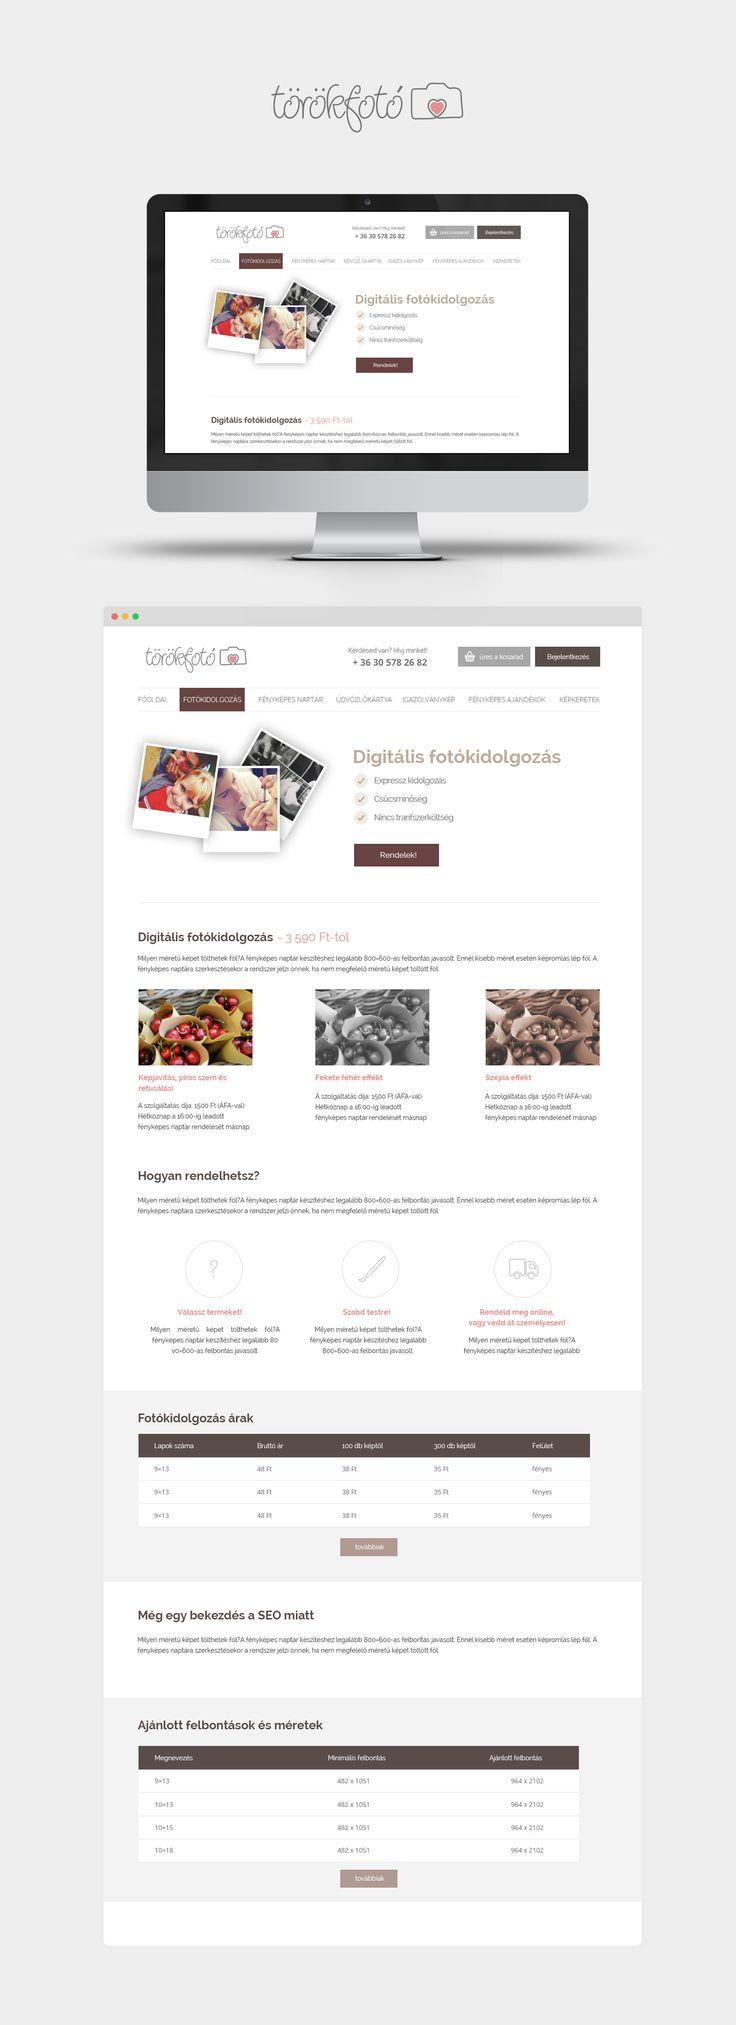 Online photography and gift webshop design. #webshop #webshopdesign#webdesgin